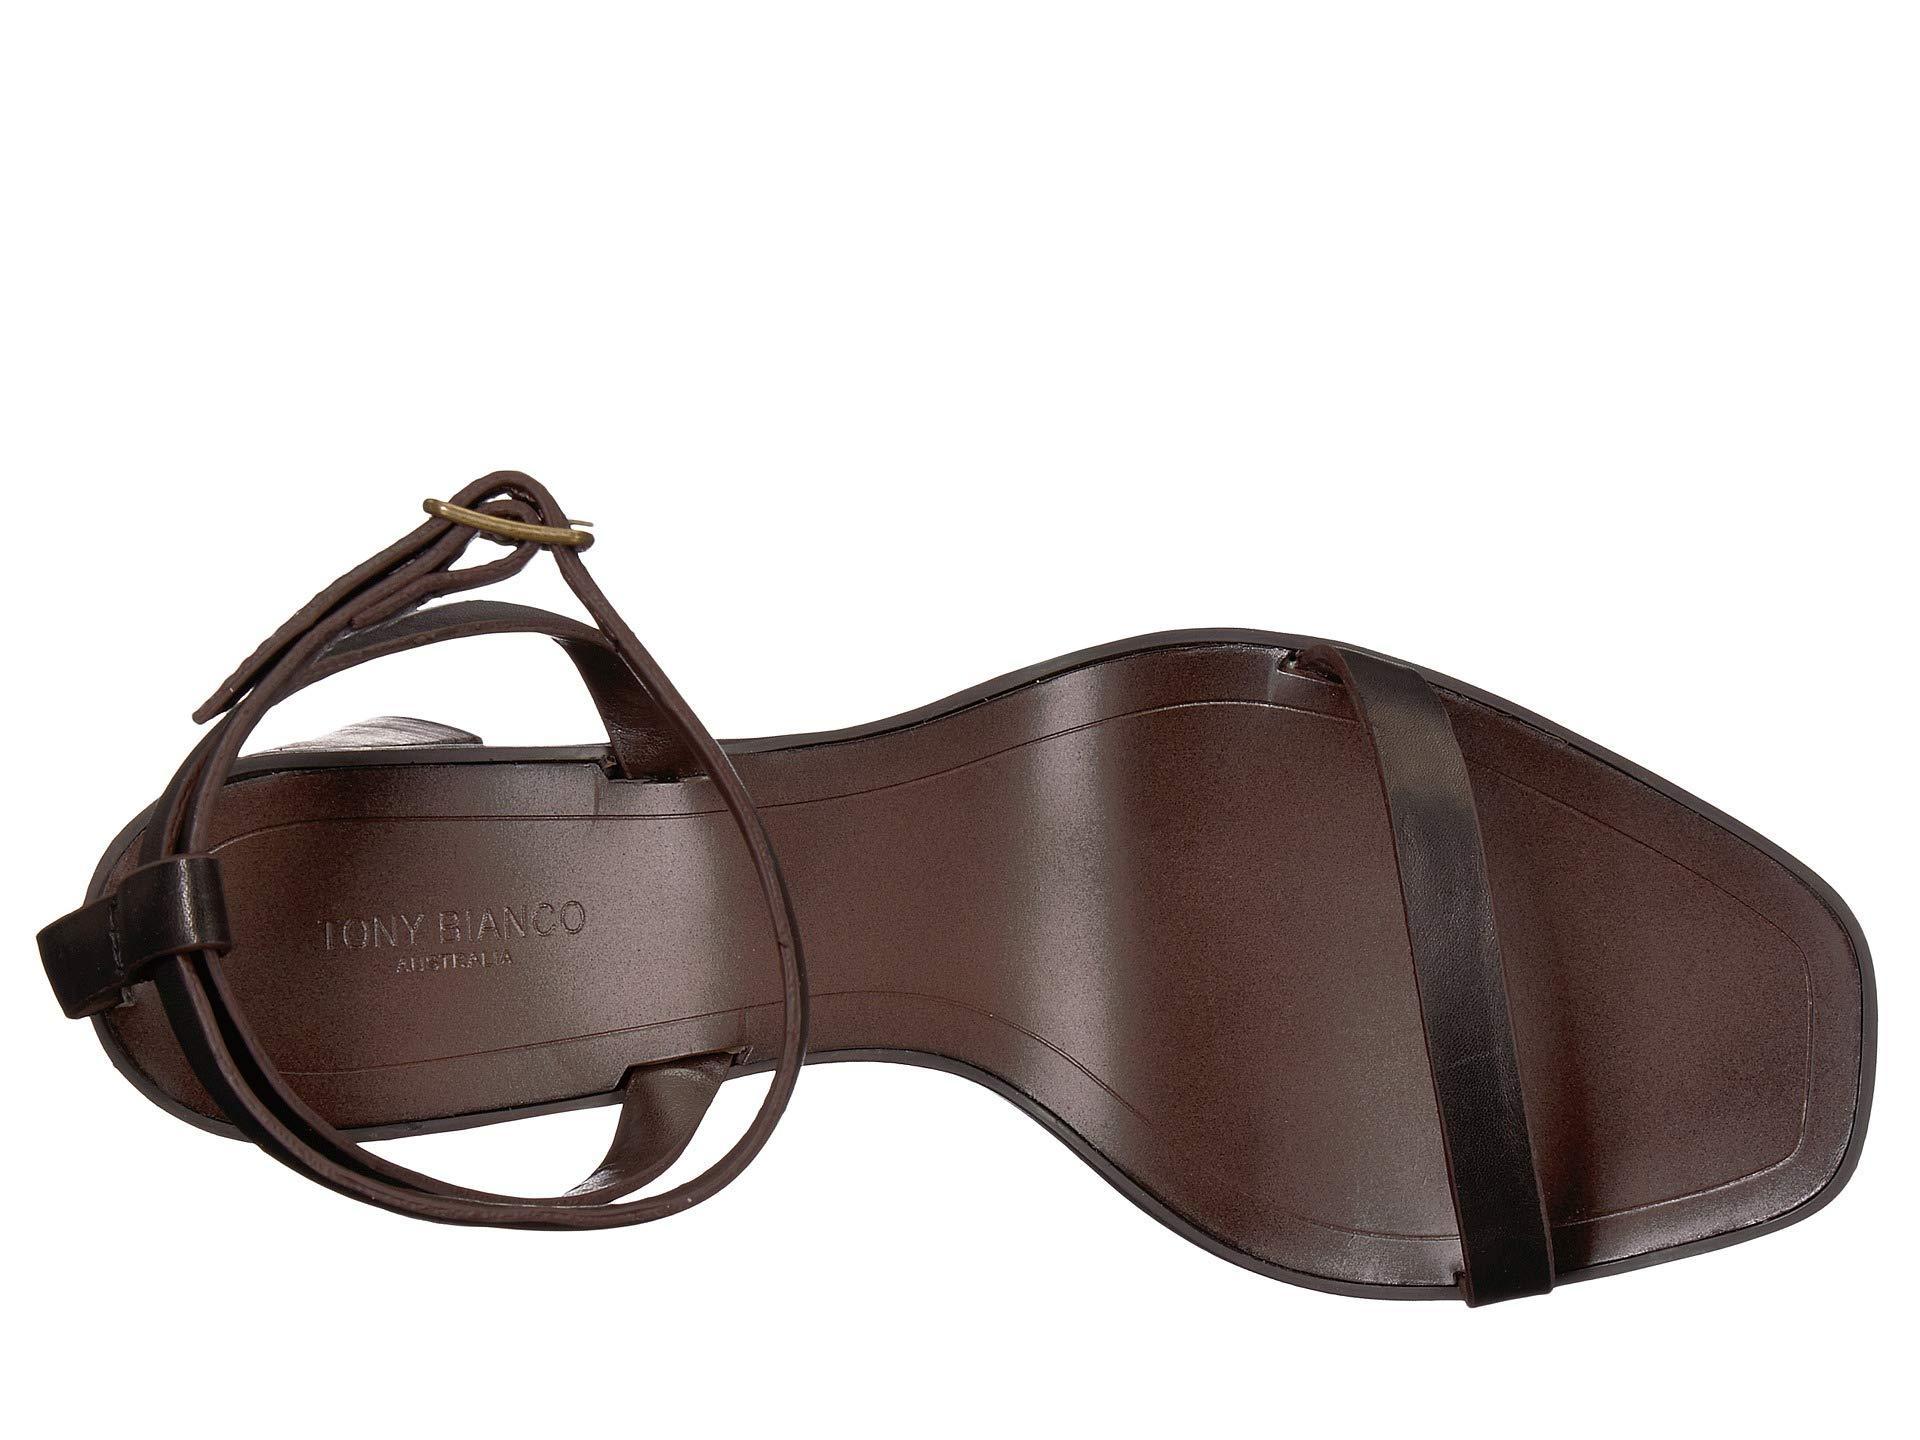 c413b0f7ed21 Lyst - Tony Bianco Casadi (black Monaco) Women s Toe Open Shoes in Black